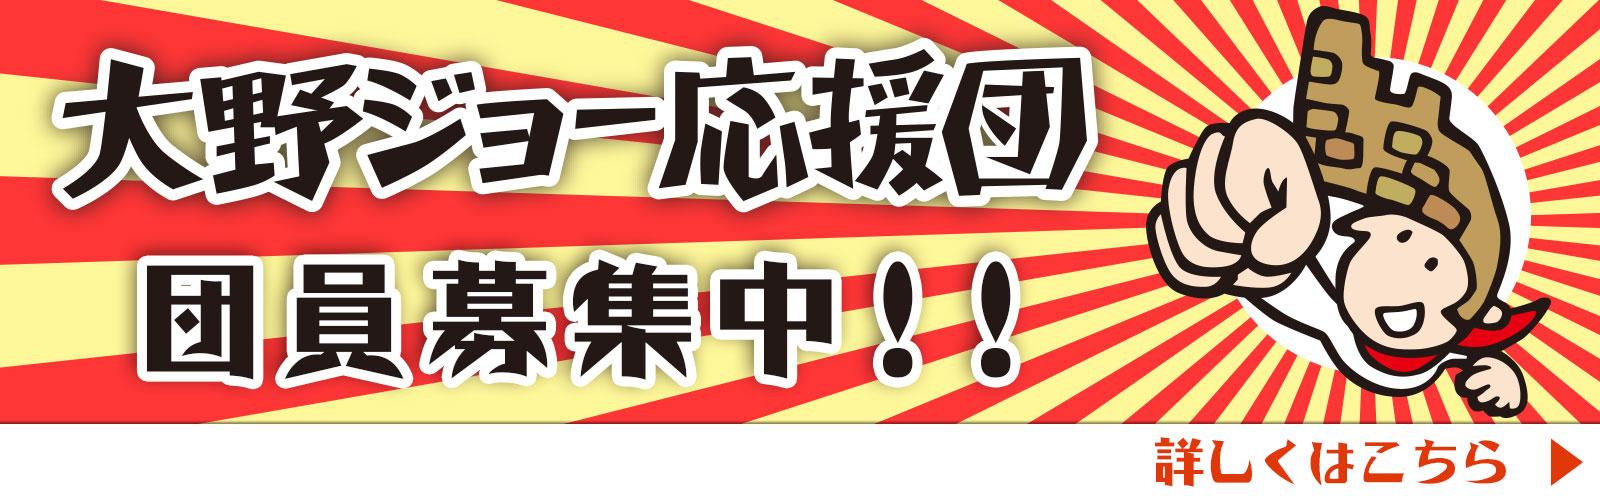 大野ジョー応援団 団員募集中!